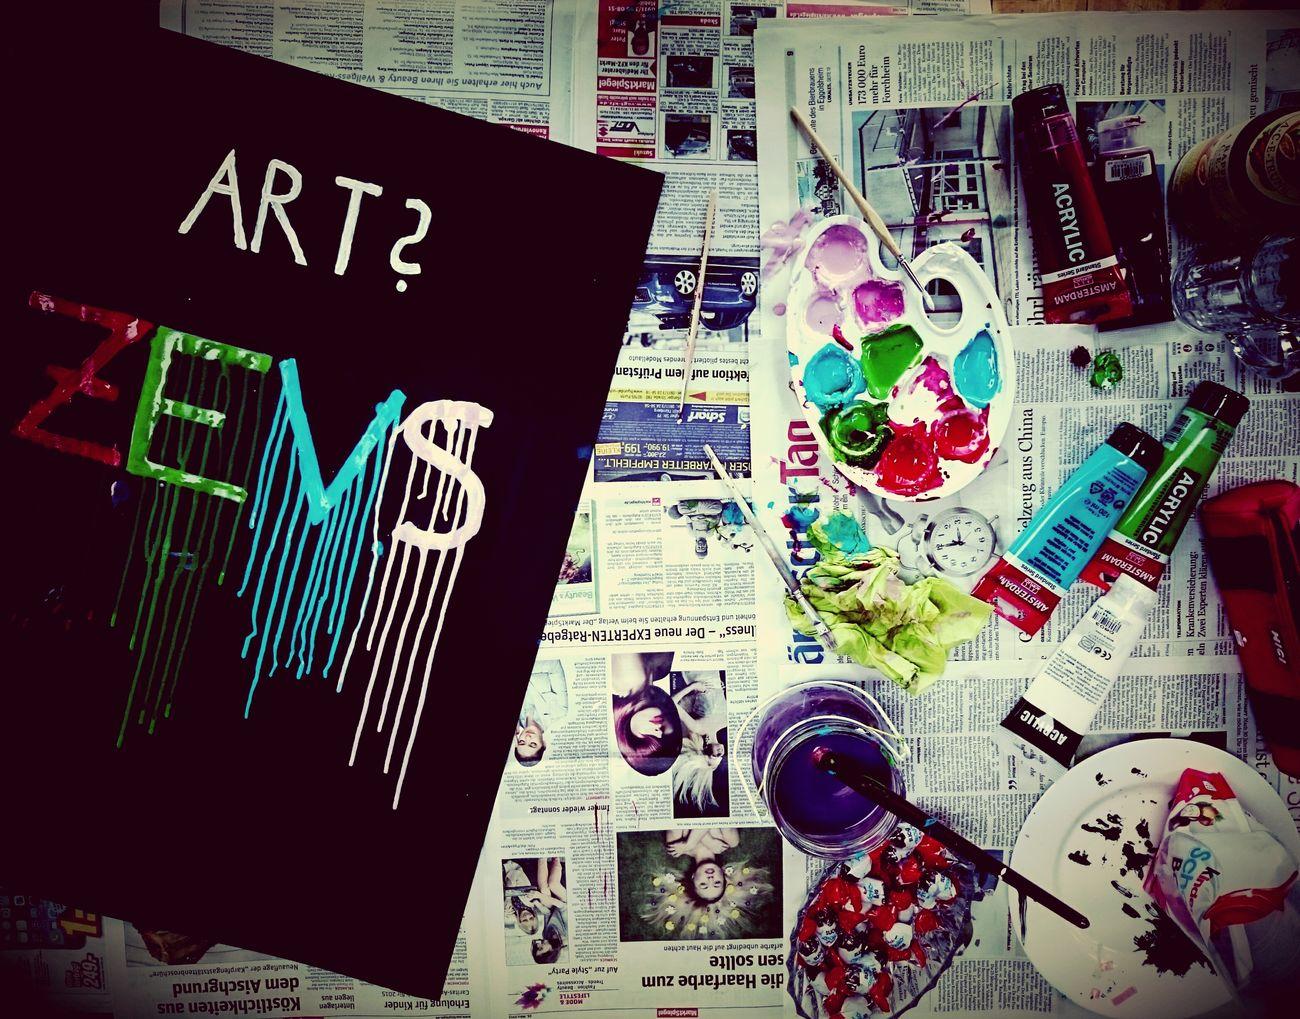 Sunday Afternoon Sunday Drawingtable Zevs Art Graffiti My Hobby Sweets Are  Important School Snapshots Of Life Drawingtime Hobby